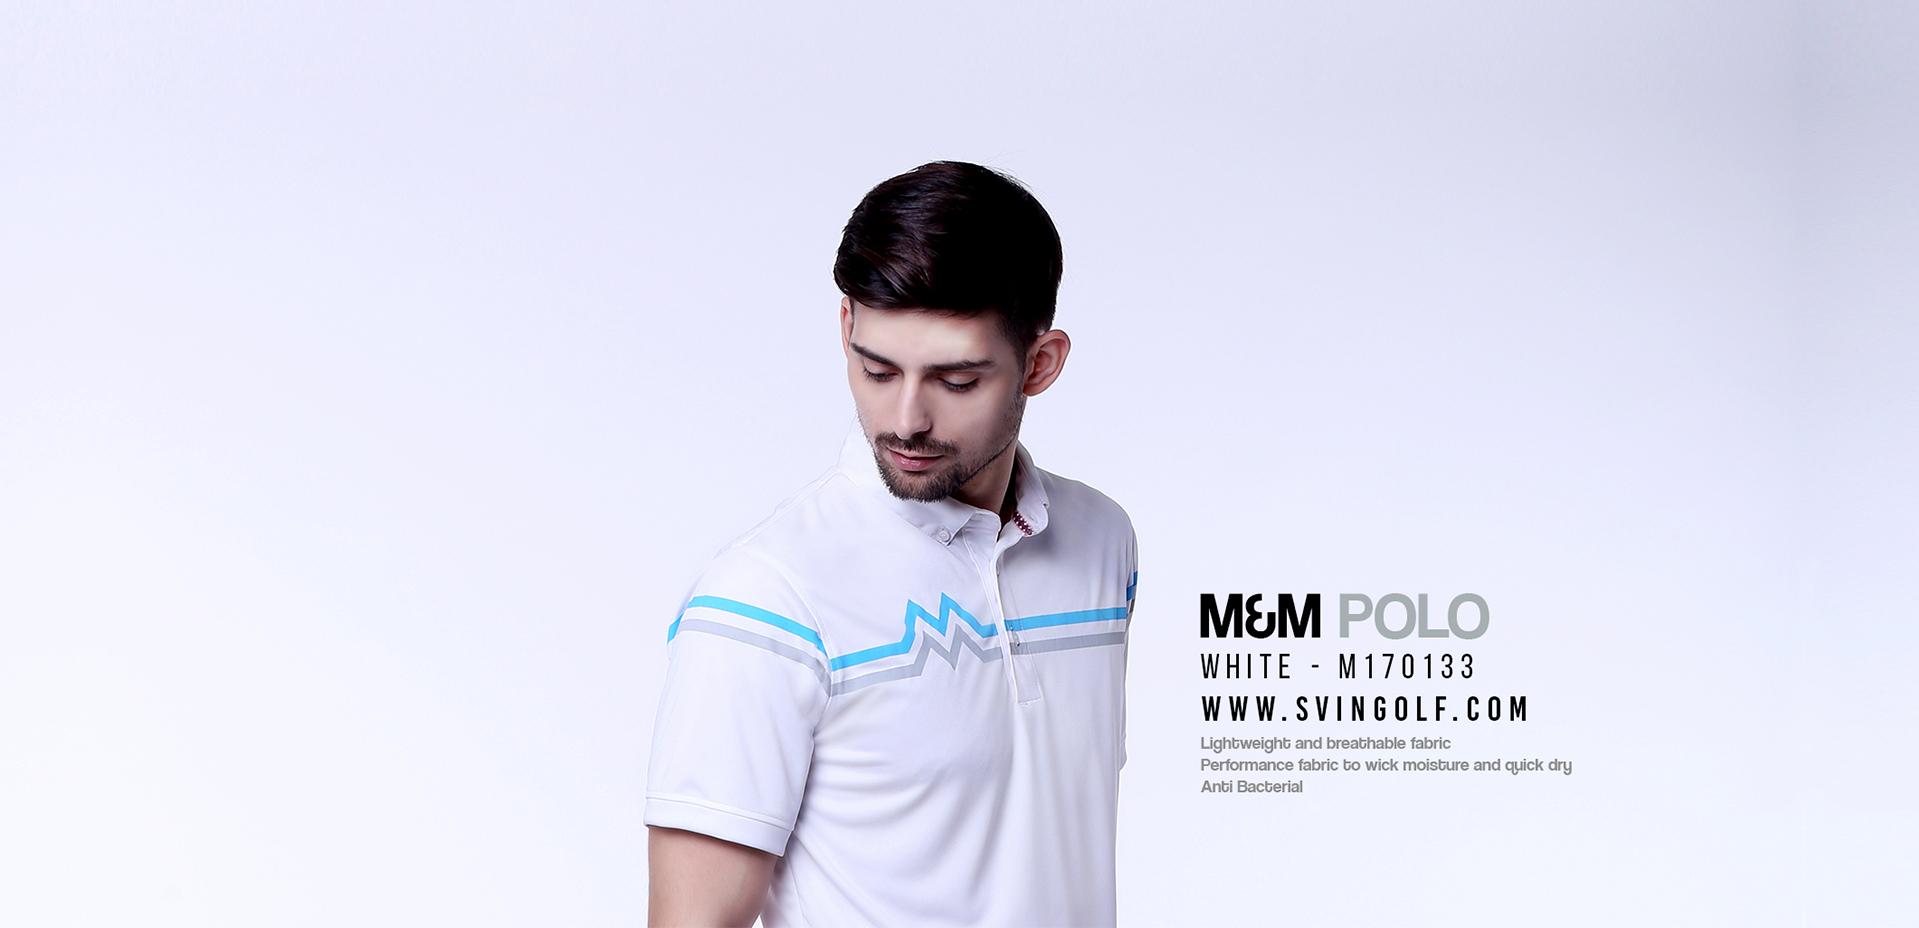 M&M POLO